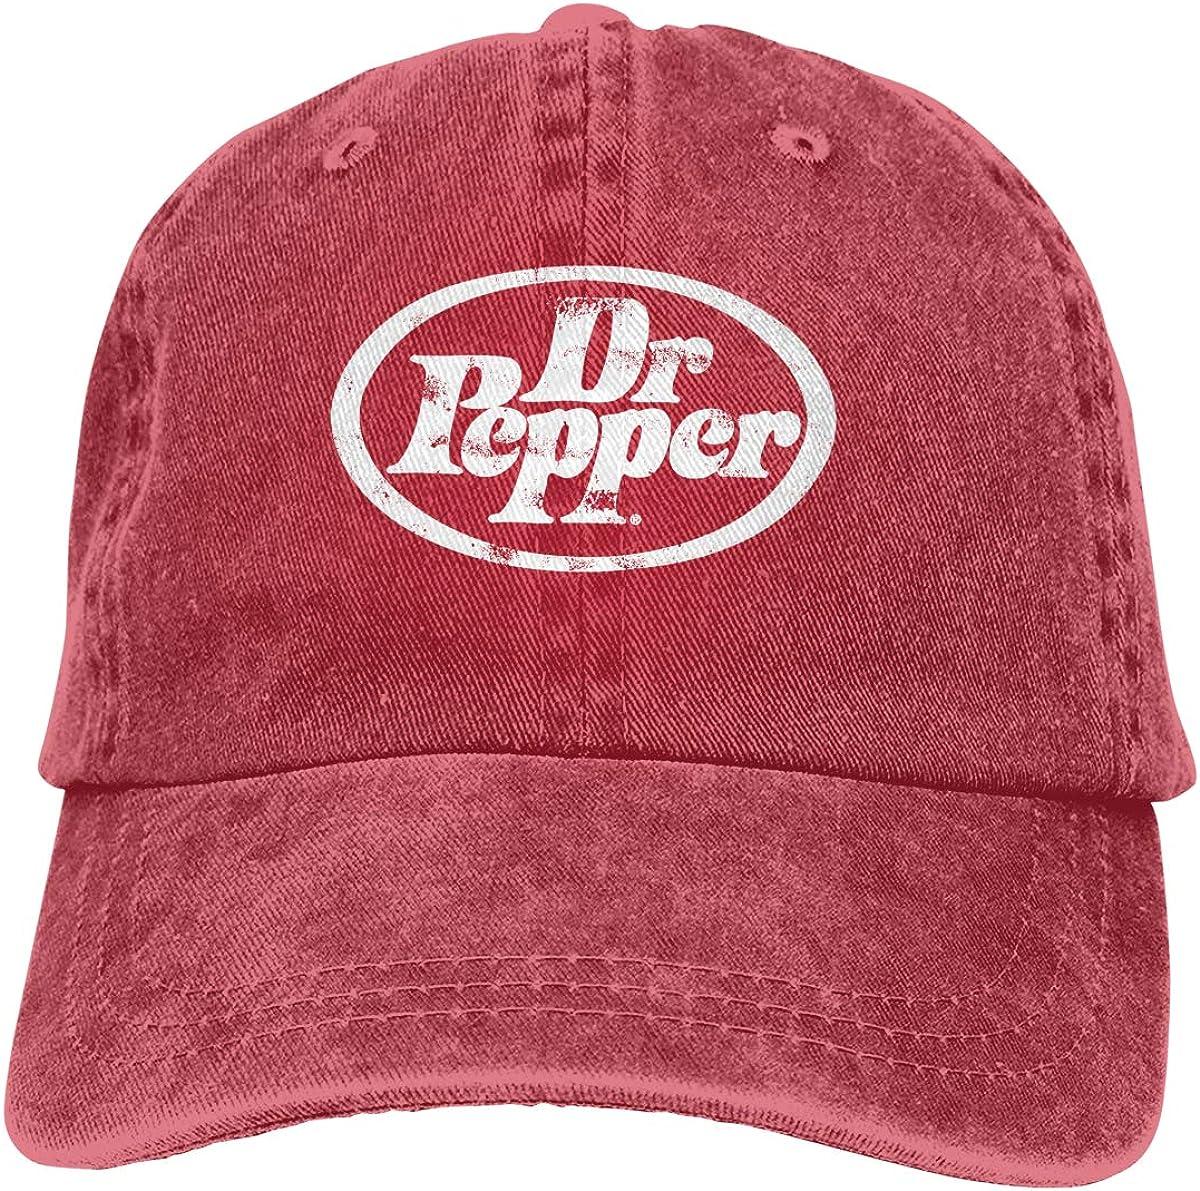 Dunpaiaa Trucker Cap Dr Pepper Durable Baseball Cap,Adjustable Dad Hat Black